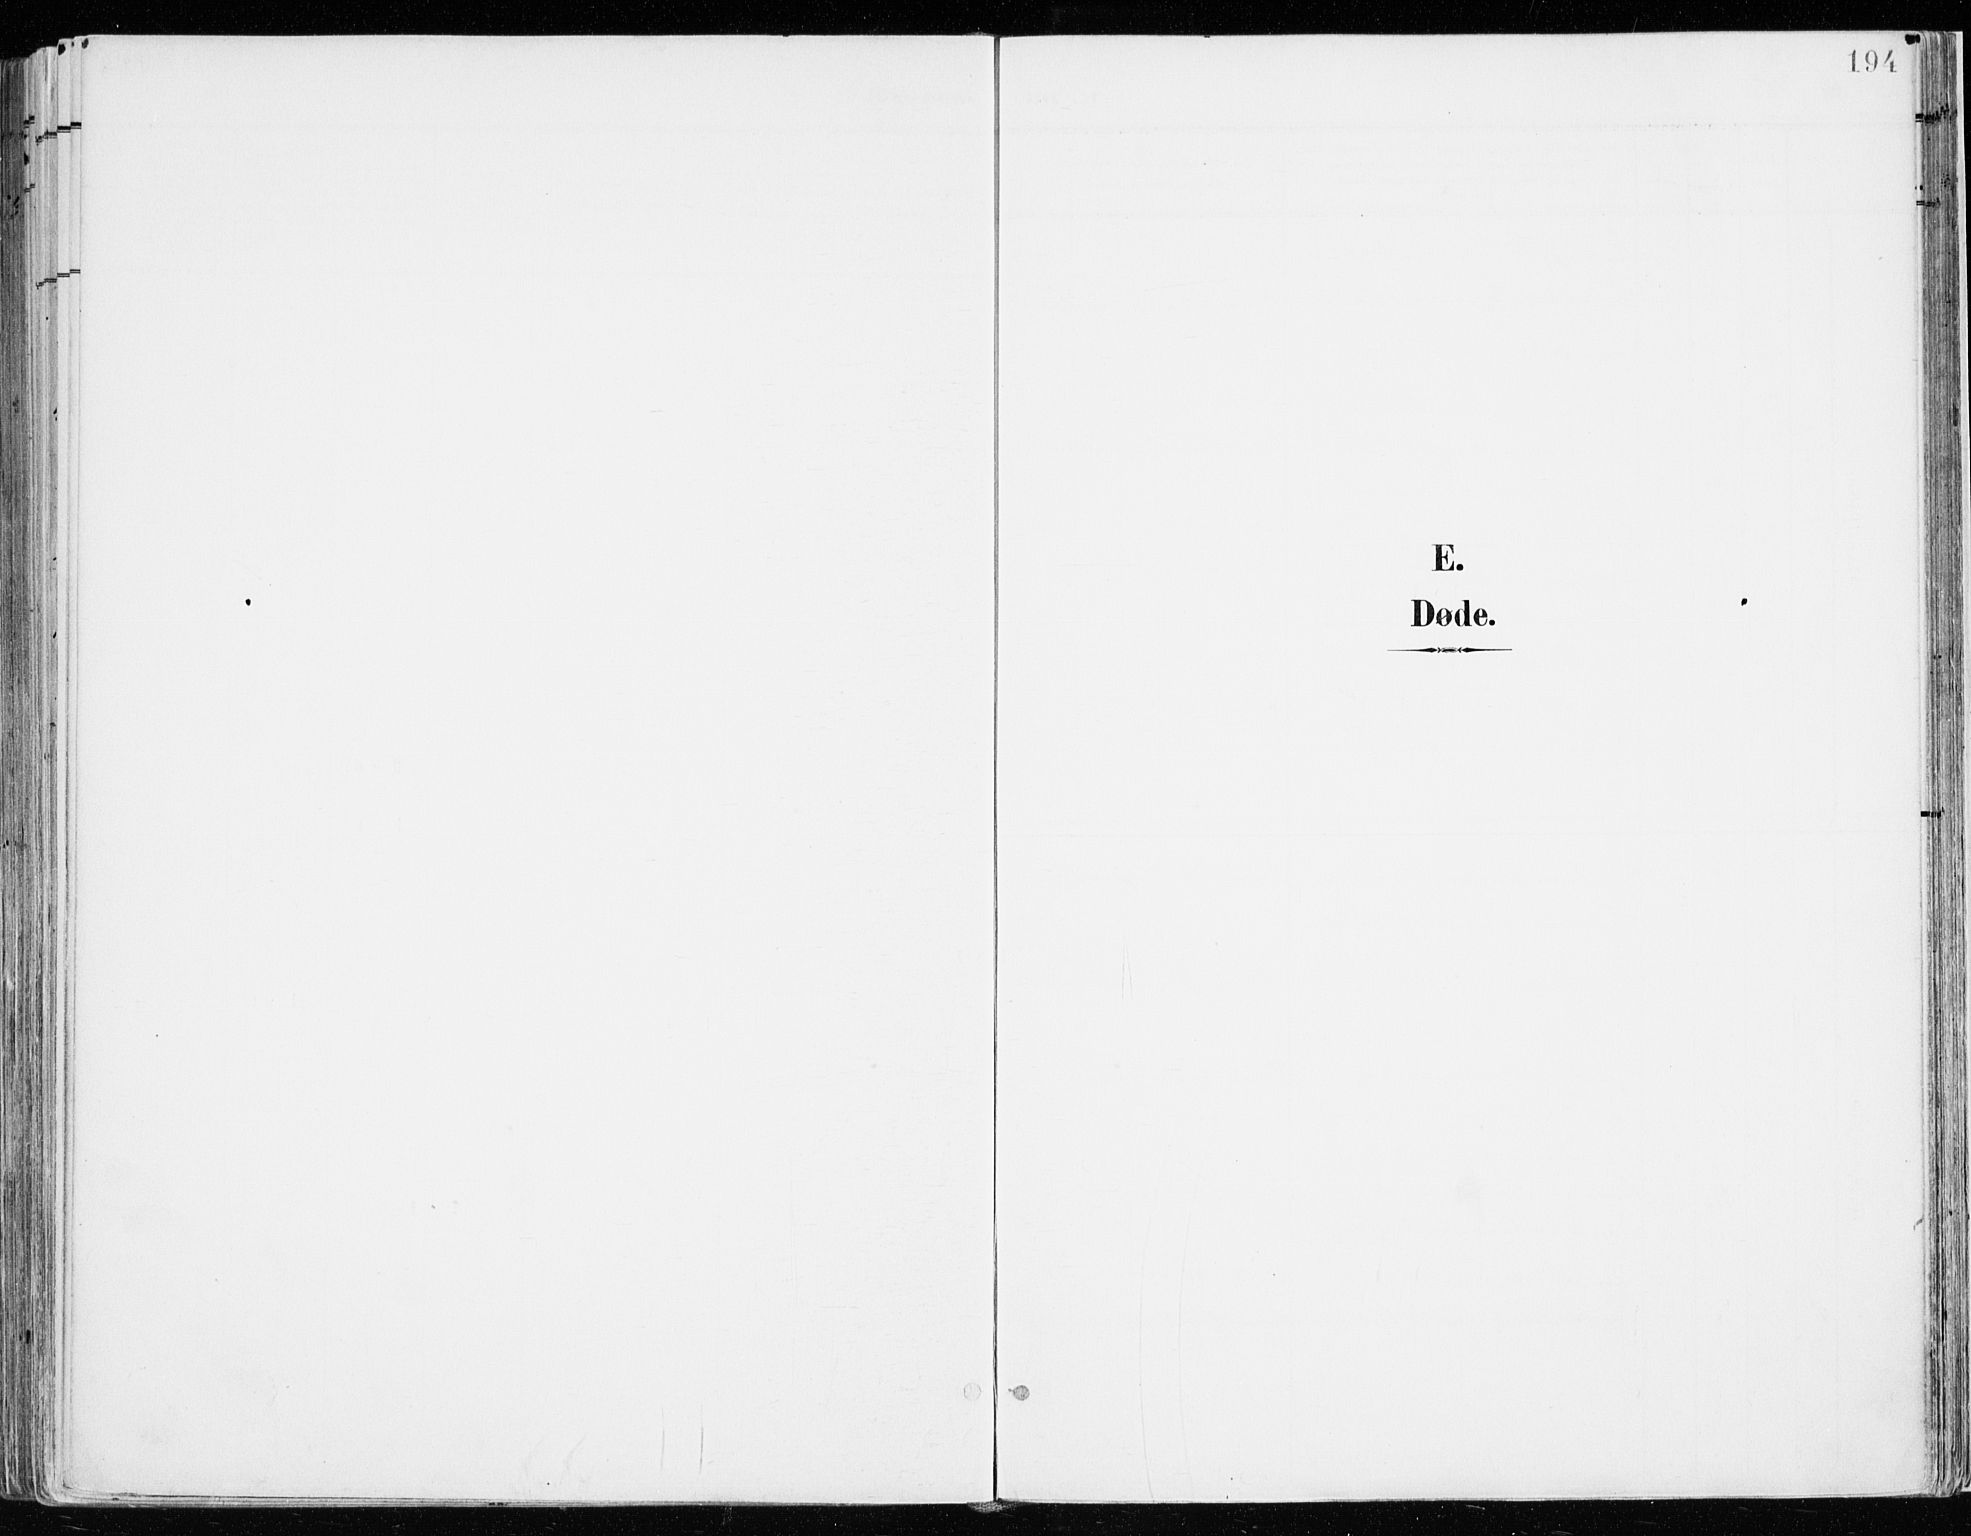 SAH, Nord-Odal prestekontor, Ministerialbok nr. 9, 1902-1926, s. 194